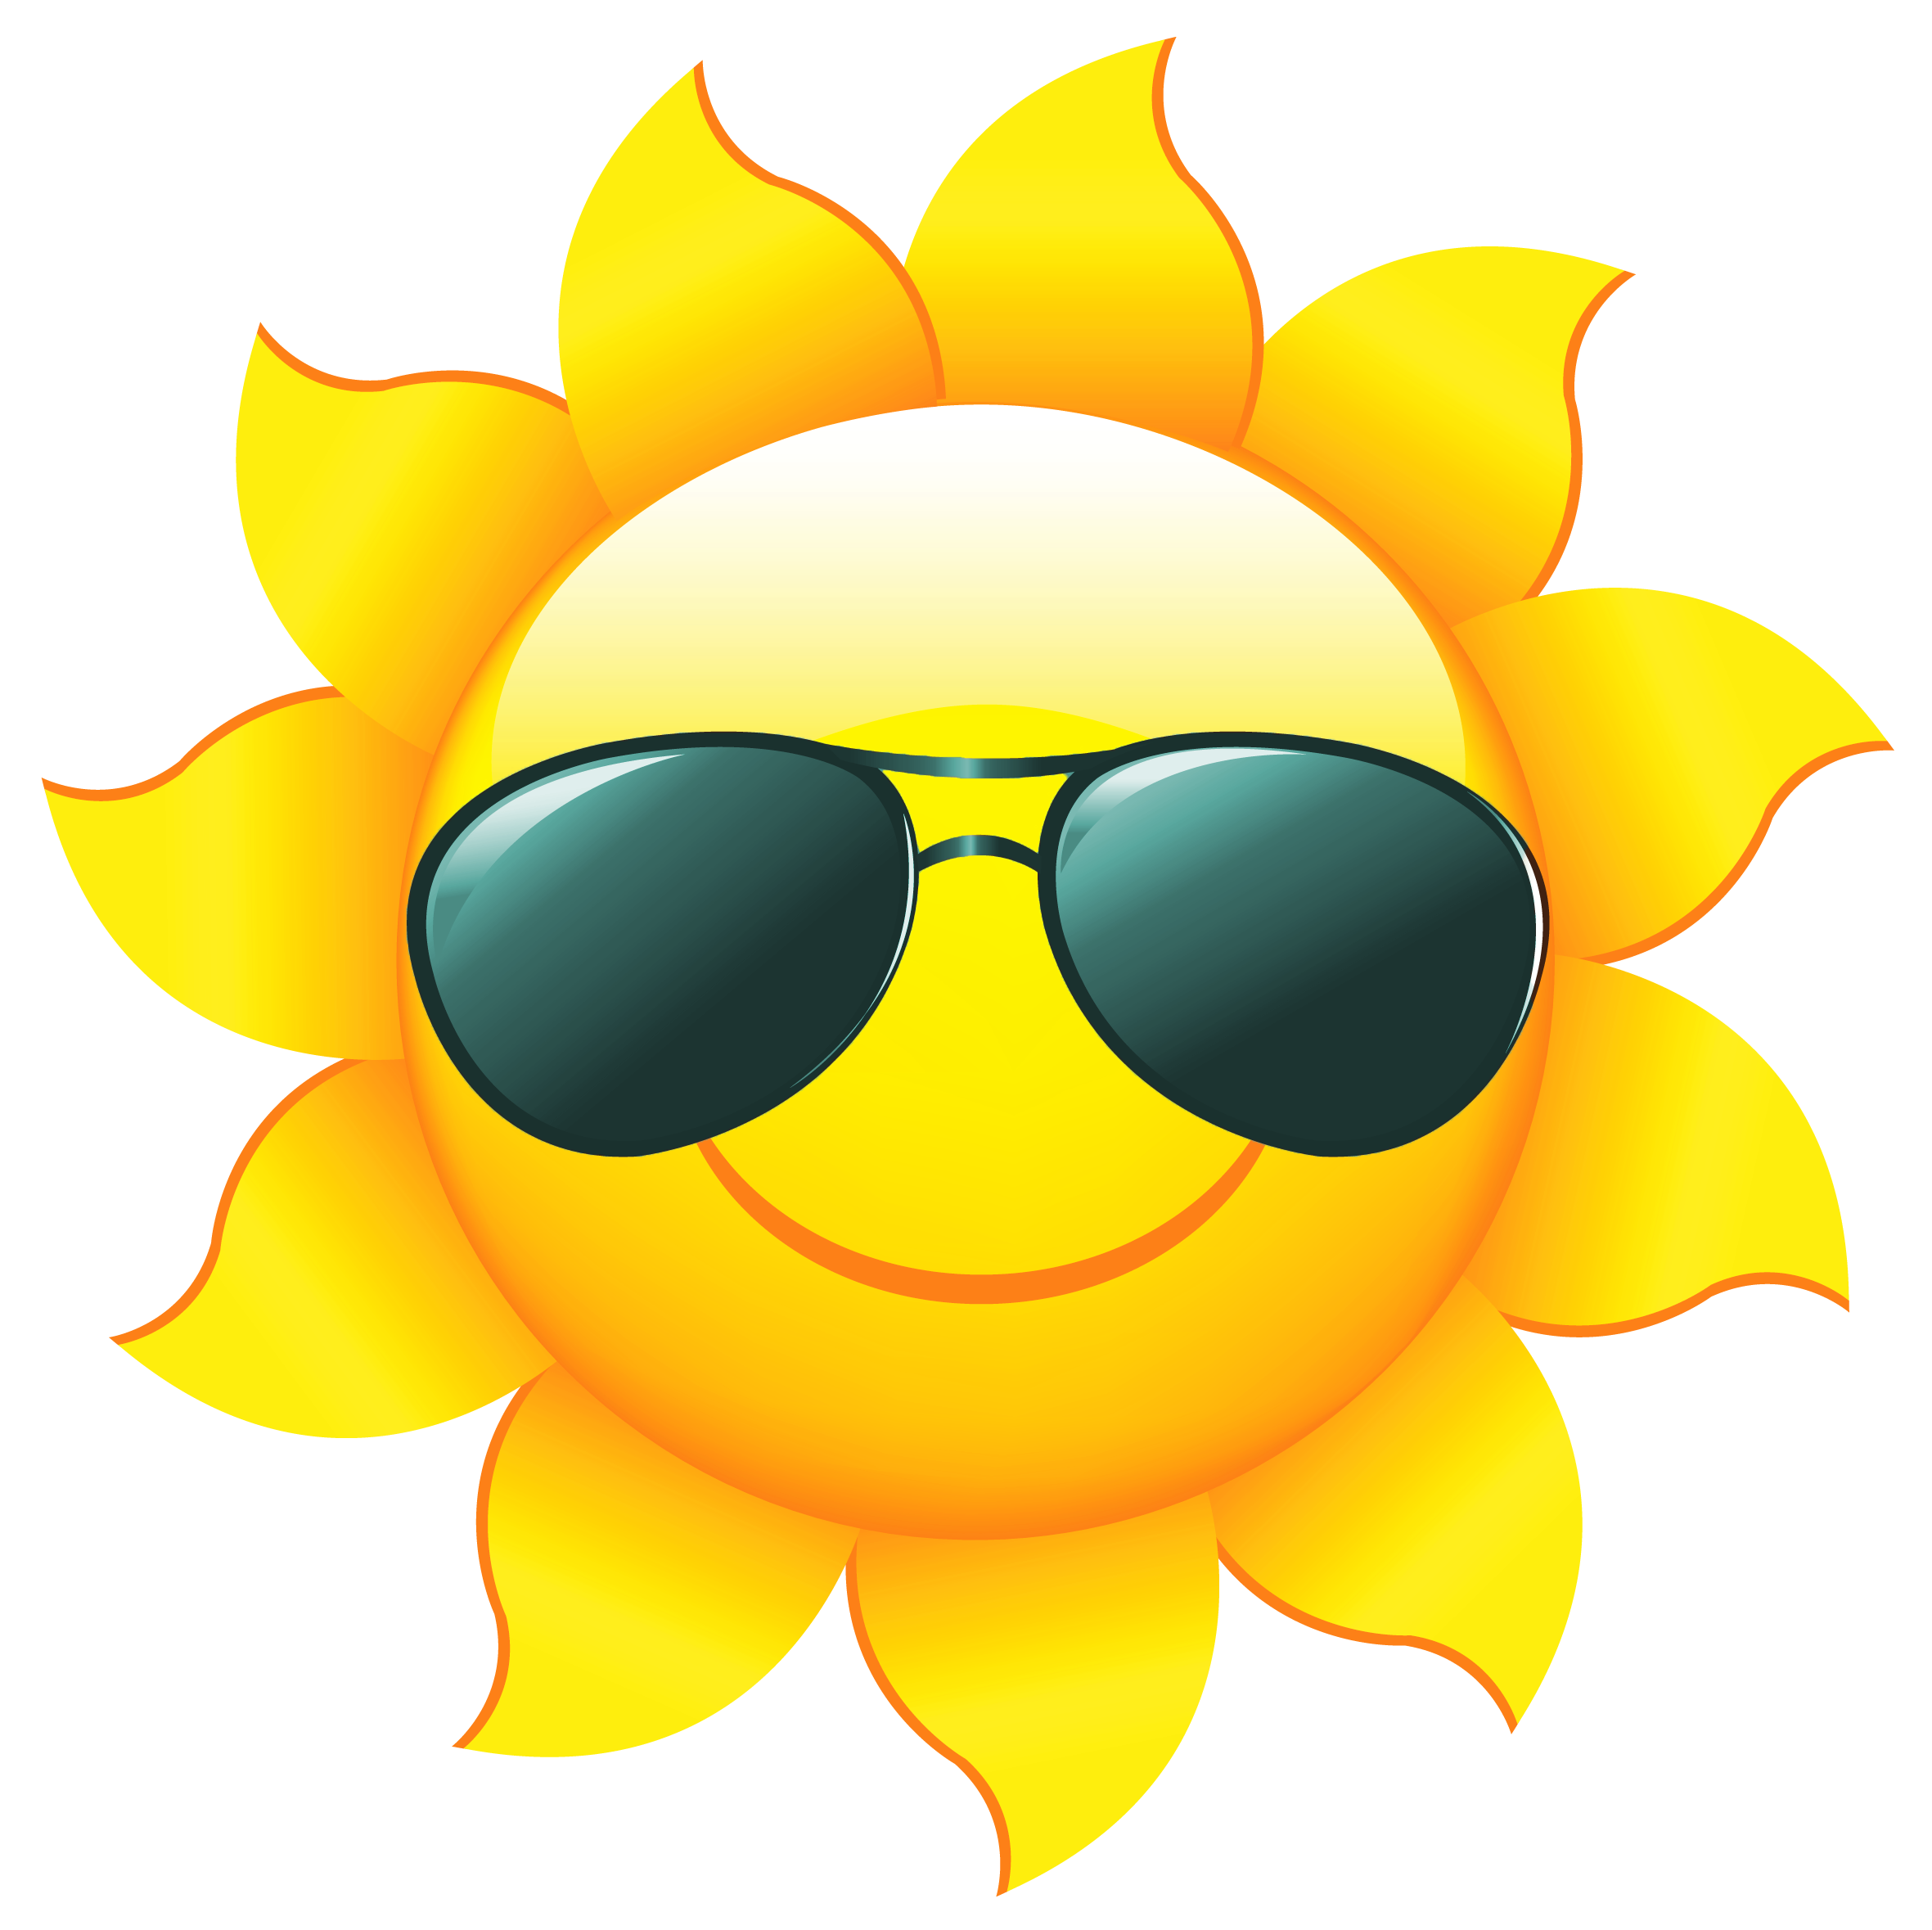 2361x2358 Sun With Sunglasses Clipart